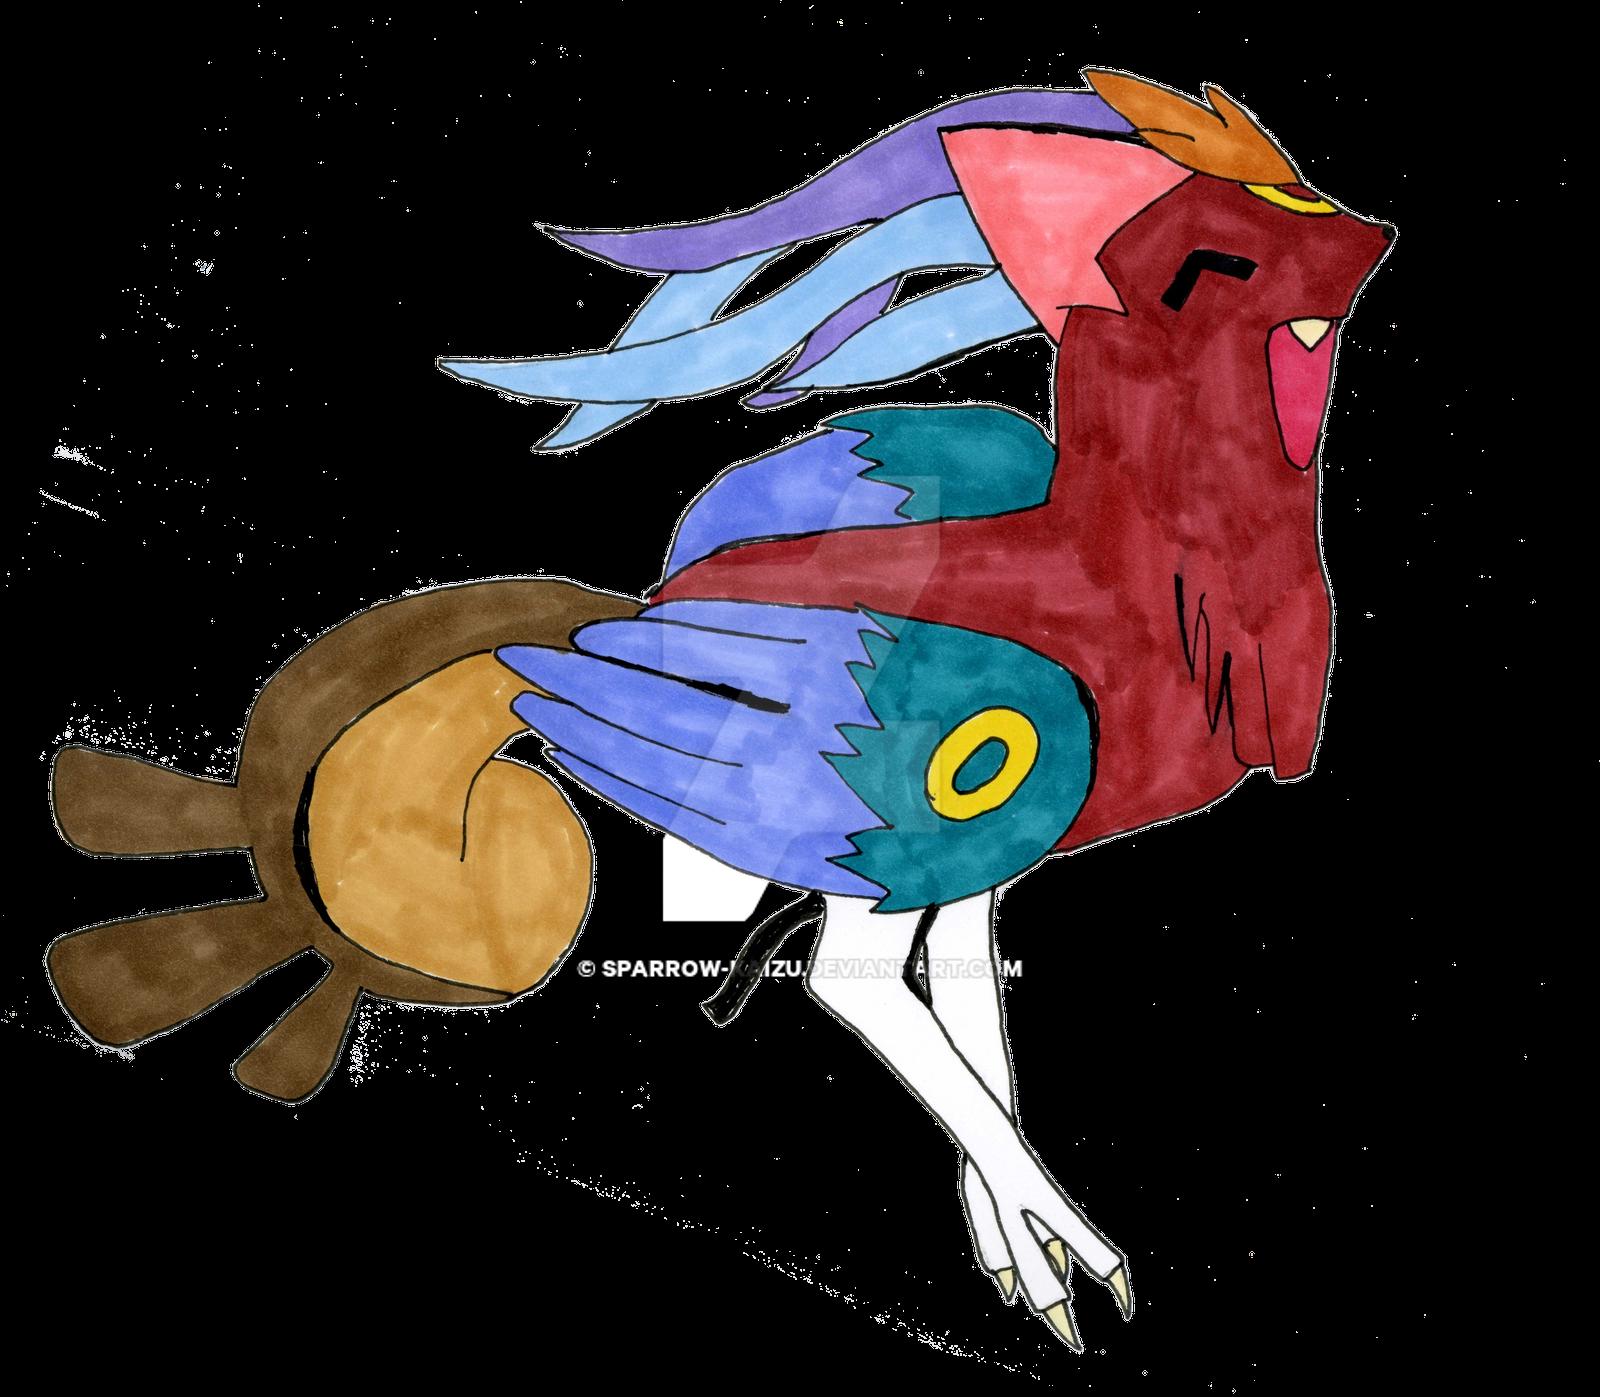 Sparrow-Kaizu's Profile Picture